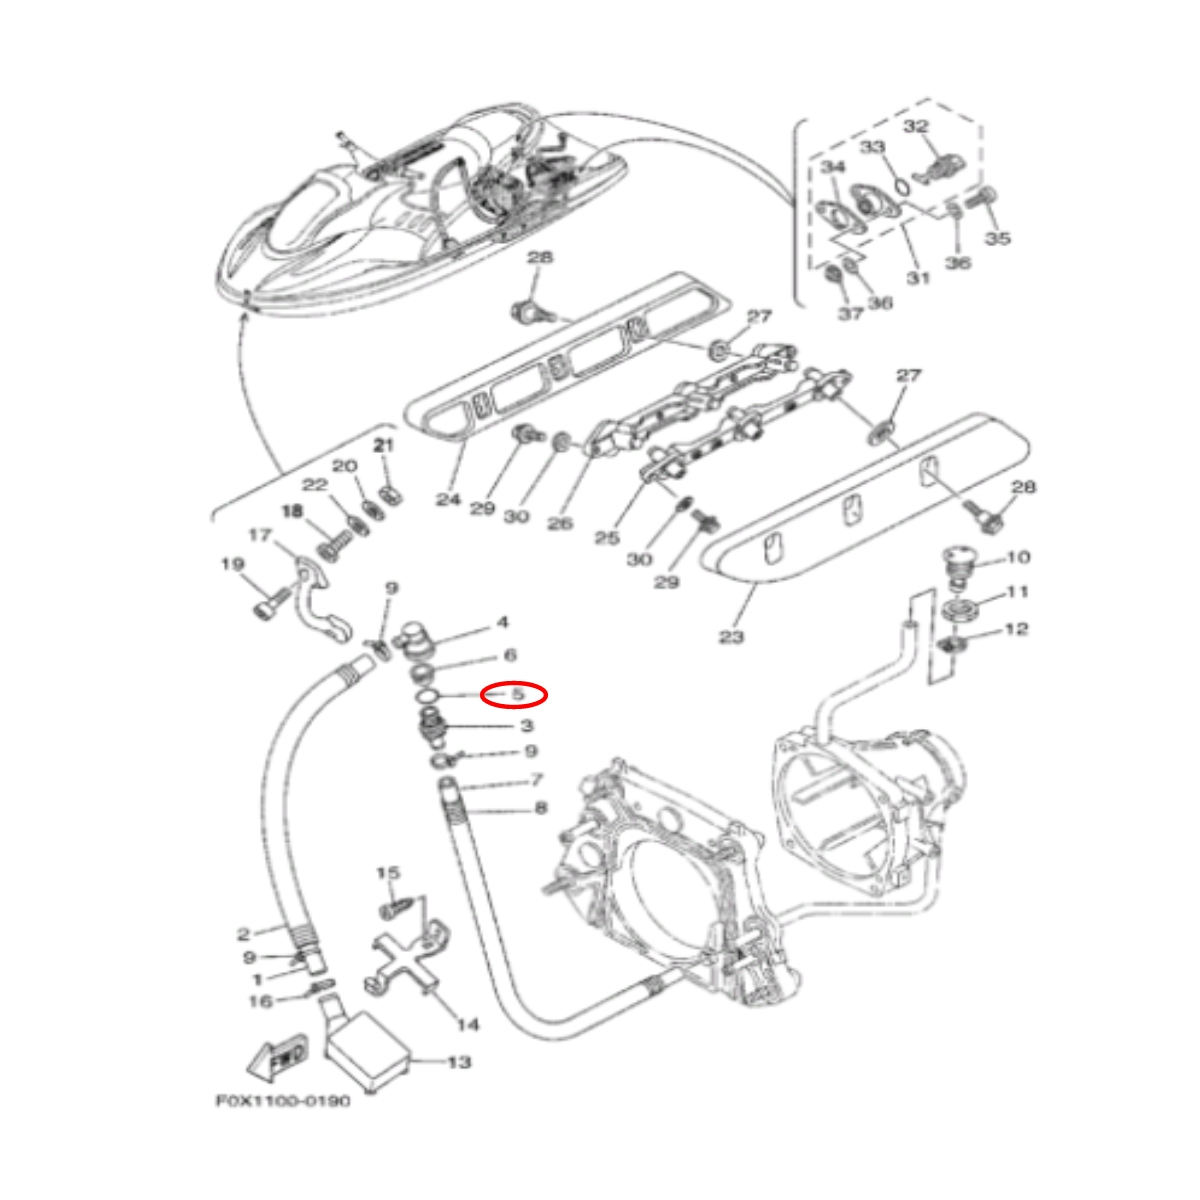 Oring Jet Ski Yamaha  - Radical Peças - Peças para Jet Ski